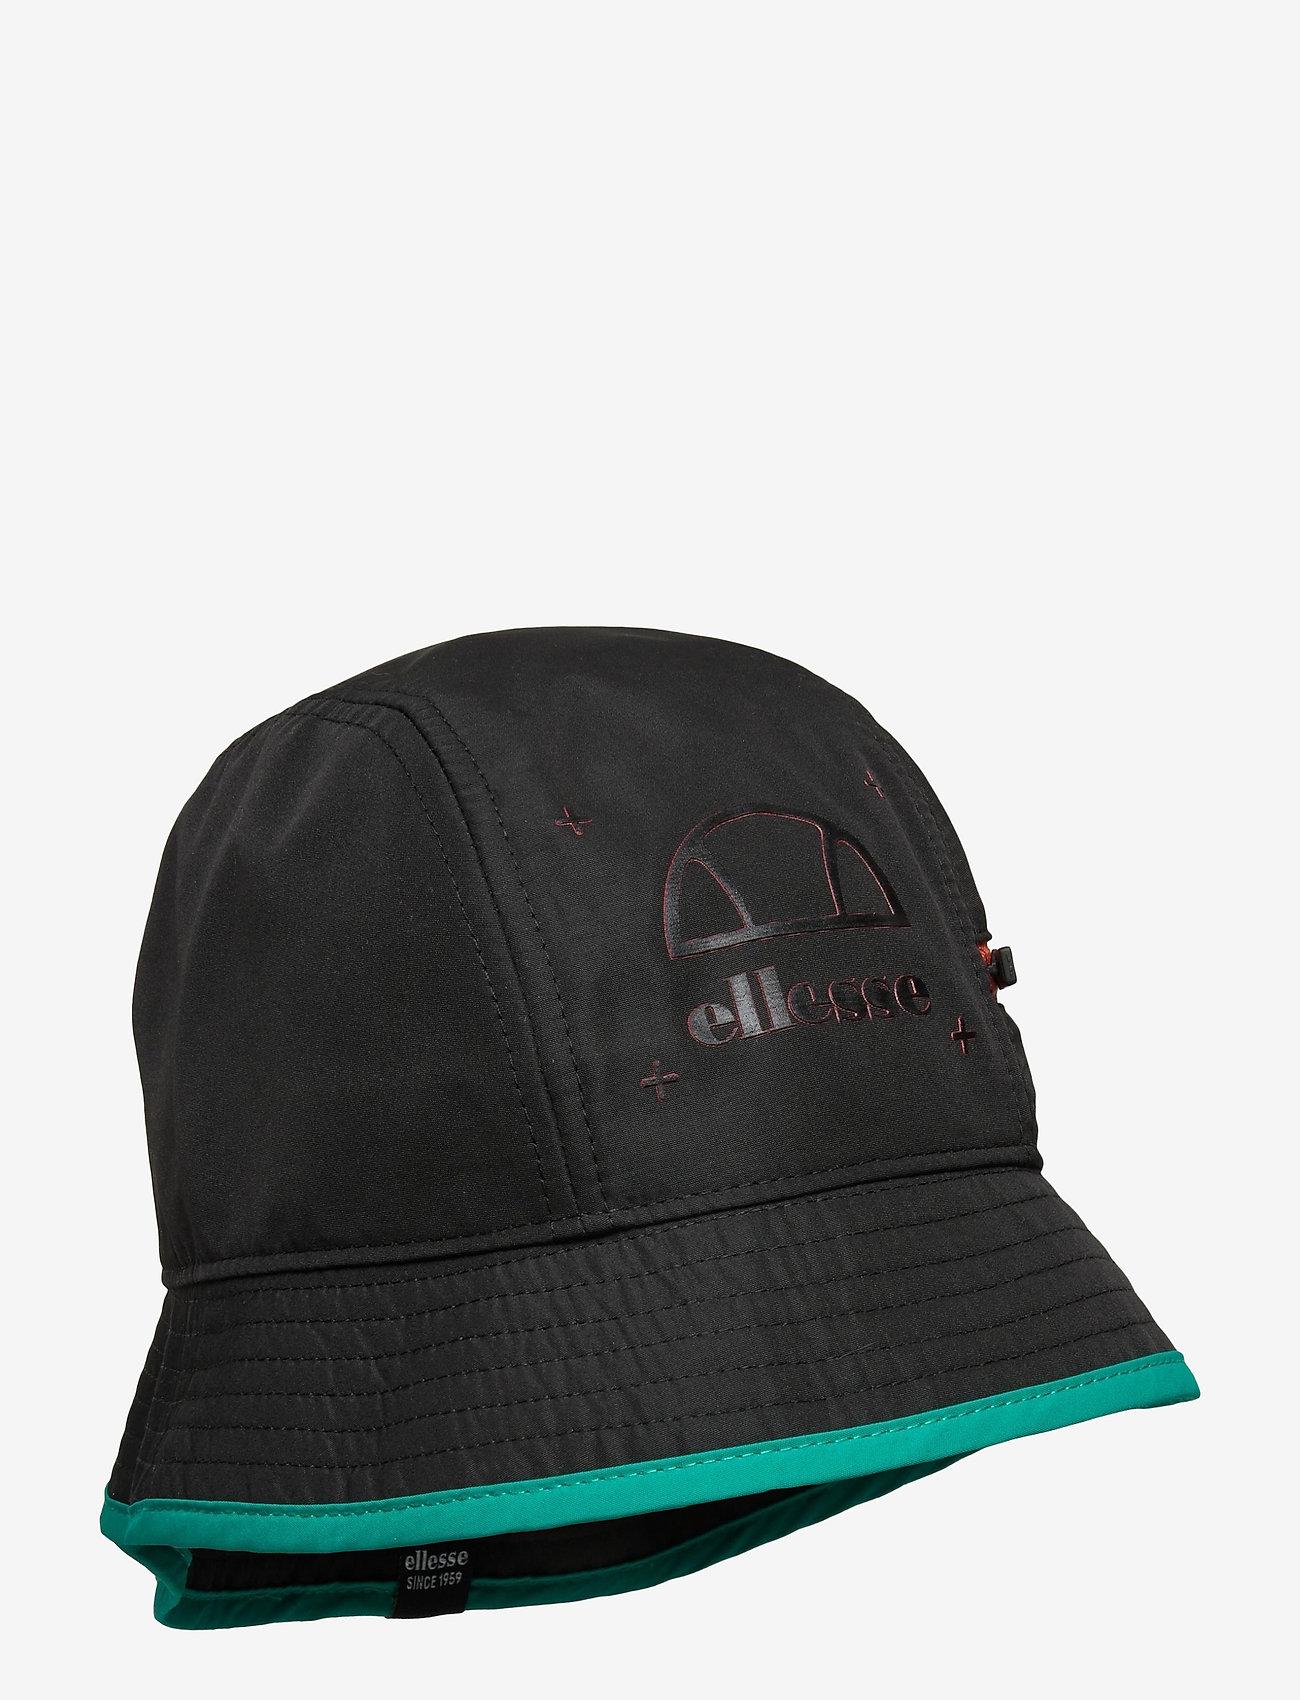 Ellesse - EL SUREFOO BUCKET HAT - bucket hats - black - 0